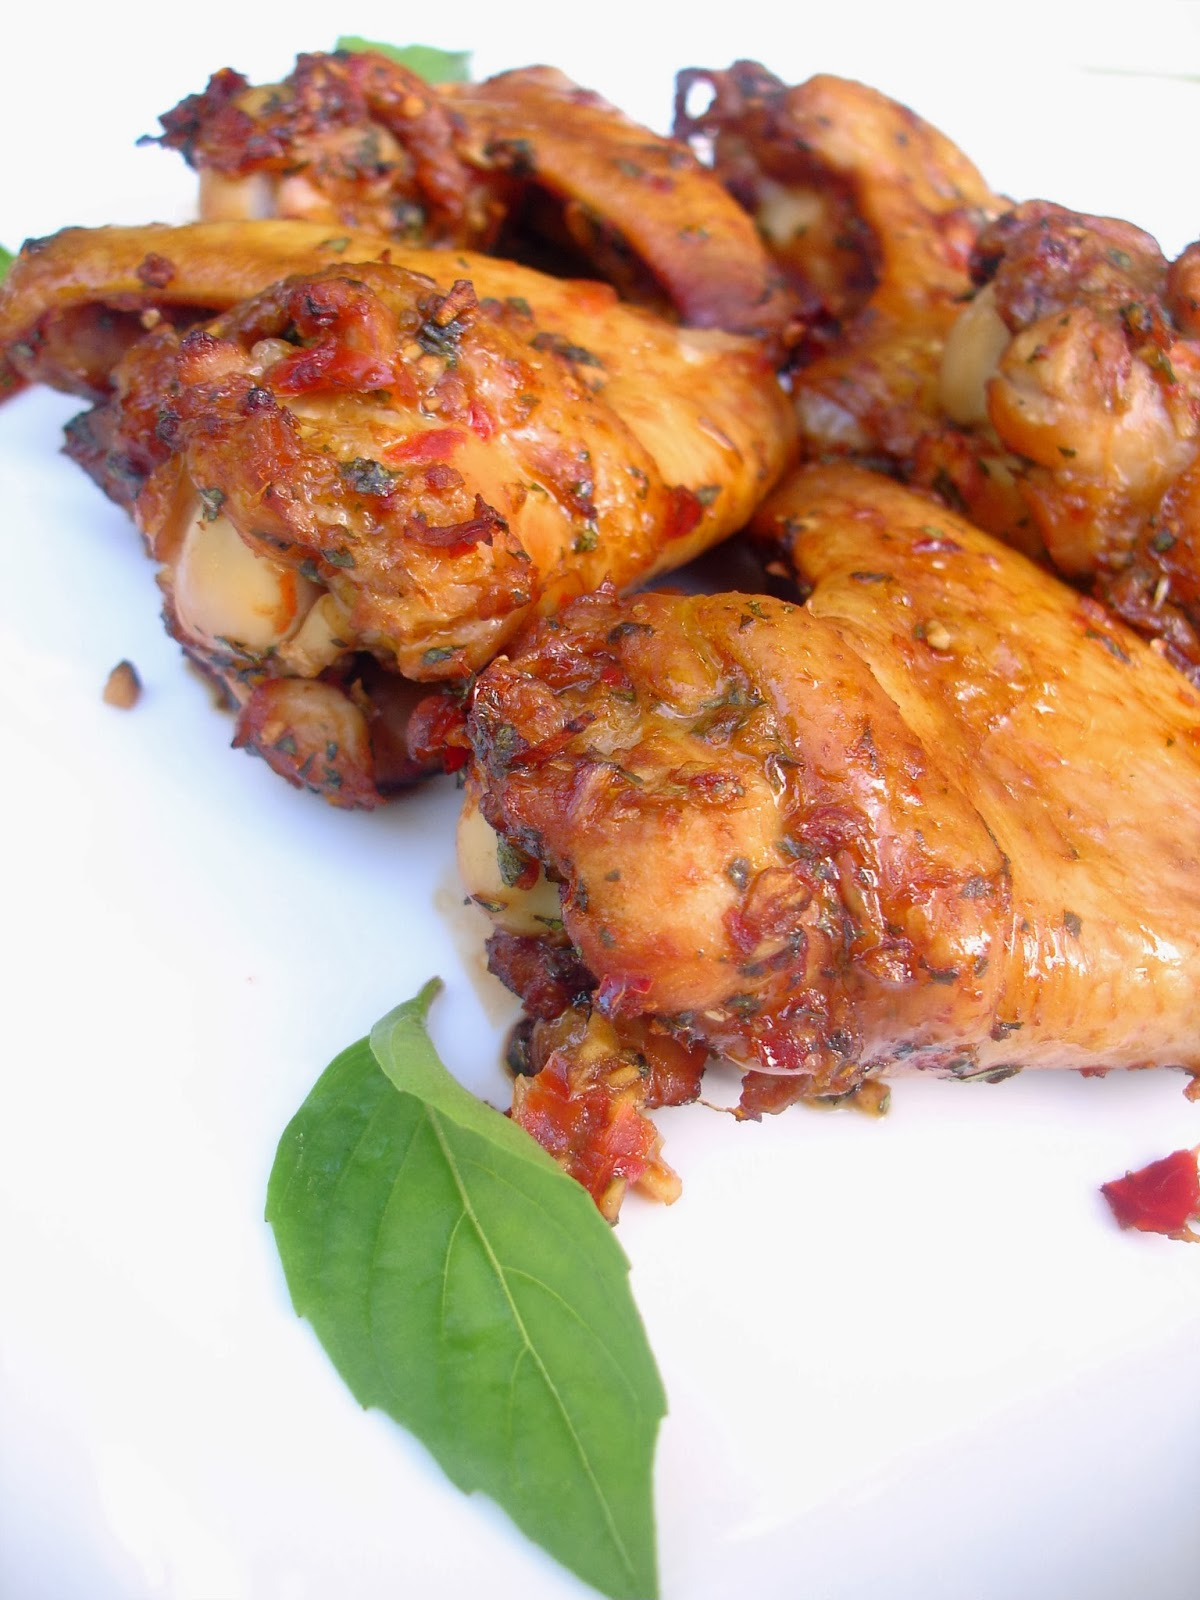 resep ayam panggang gardenia, cara membuat ayam panggang gardenia, cara memasak ayam panggang gardenia